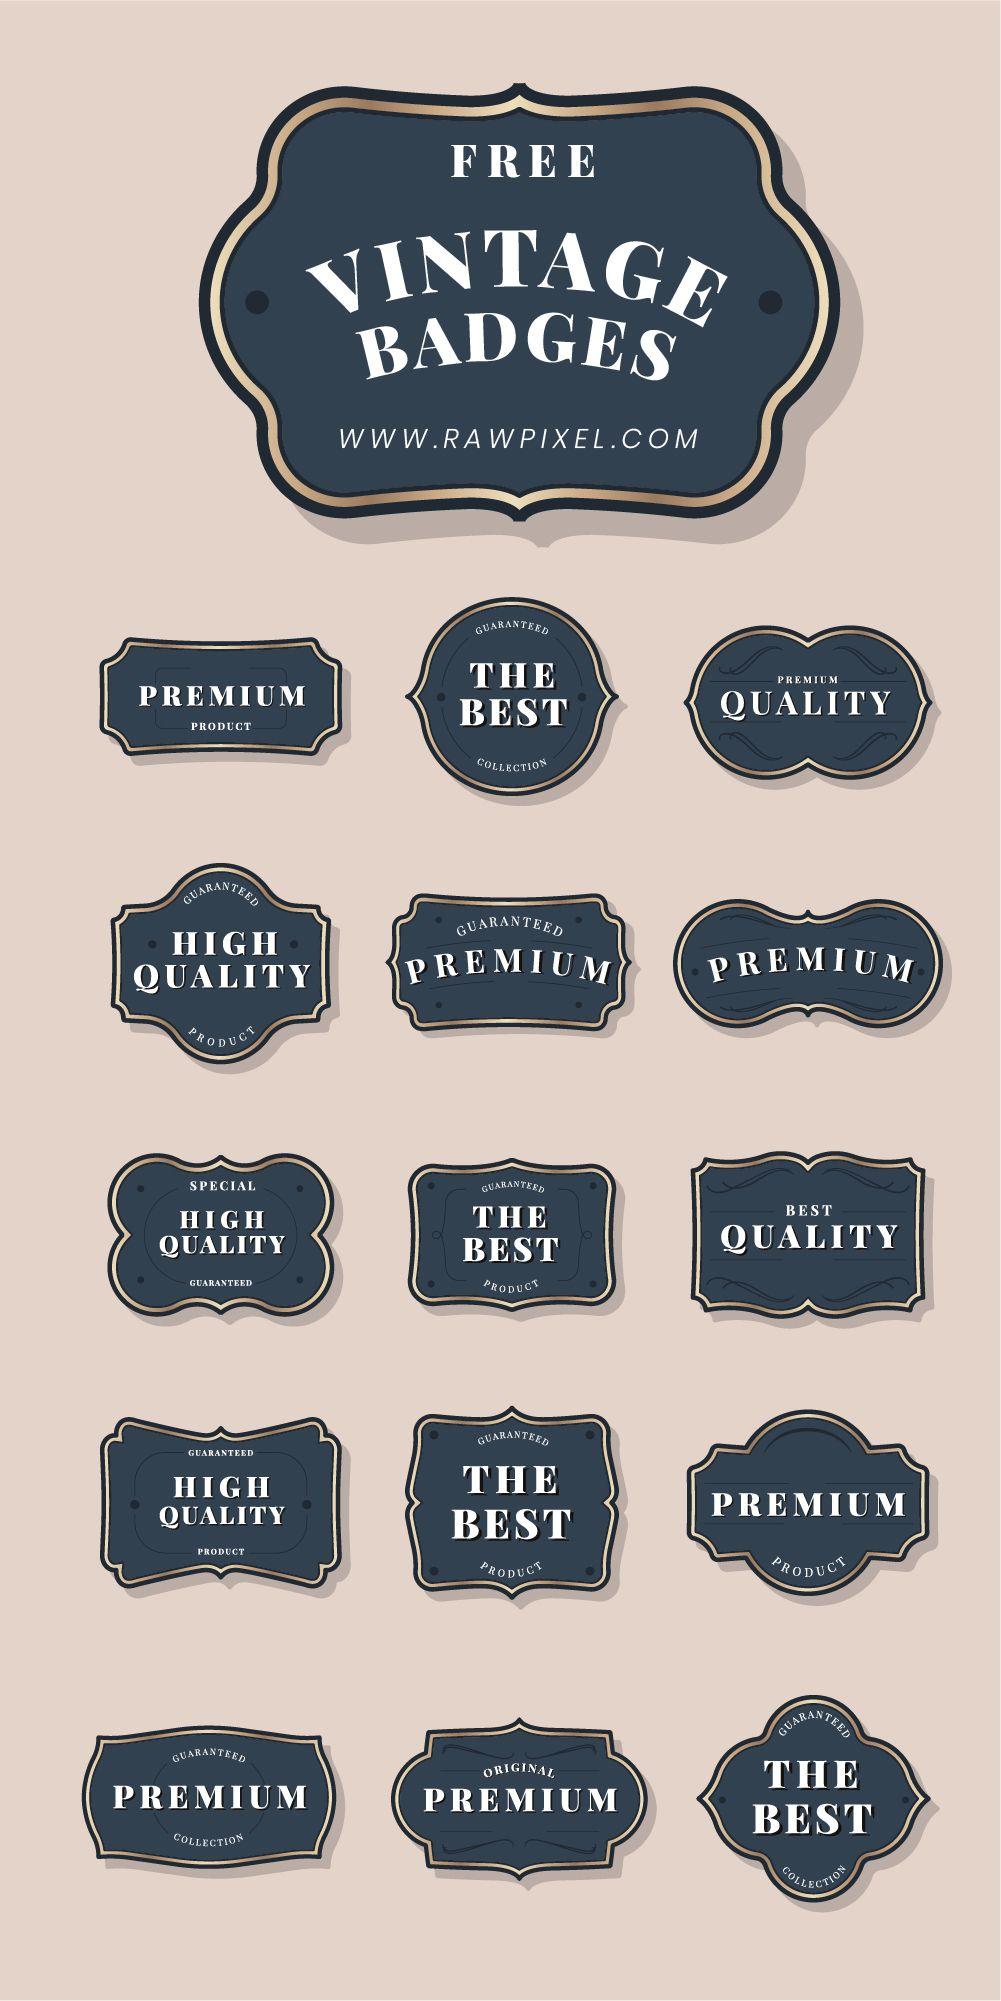 Download These Amazing And Free Royalty Free Vintage Label Vectors At Rawpixel Com Vintage Logo Design Logo Design Inspiration Creative Vintage Labels